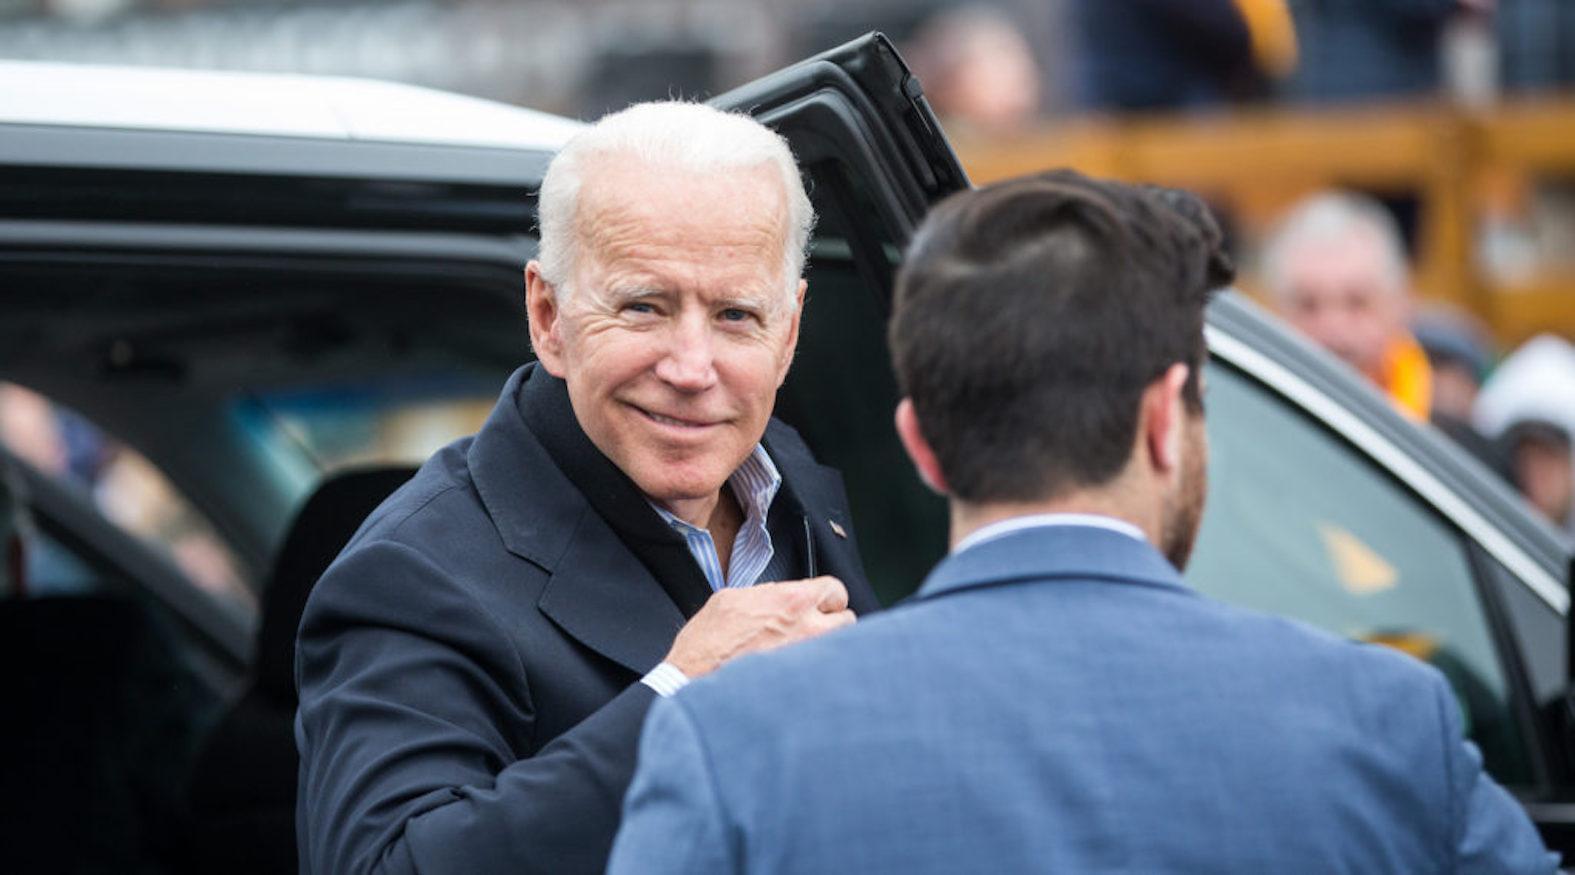 Former Staffer Accuses Joe Biden Of Sexual Assault